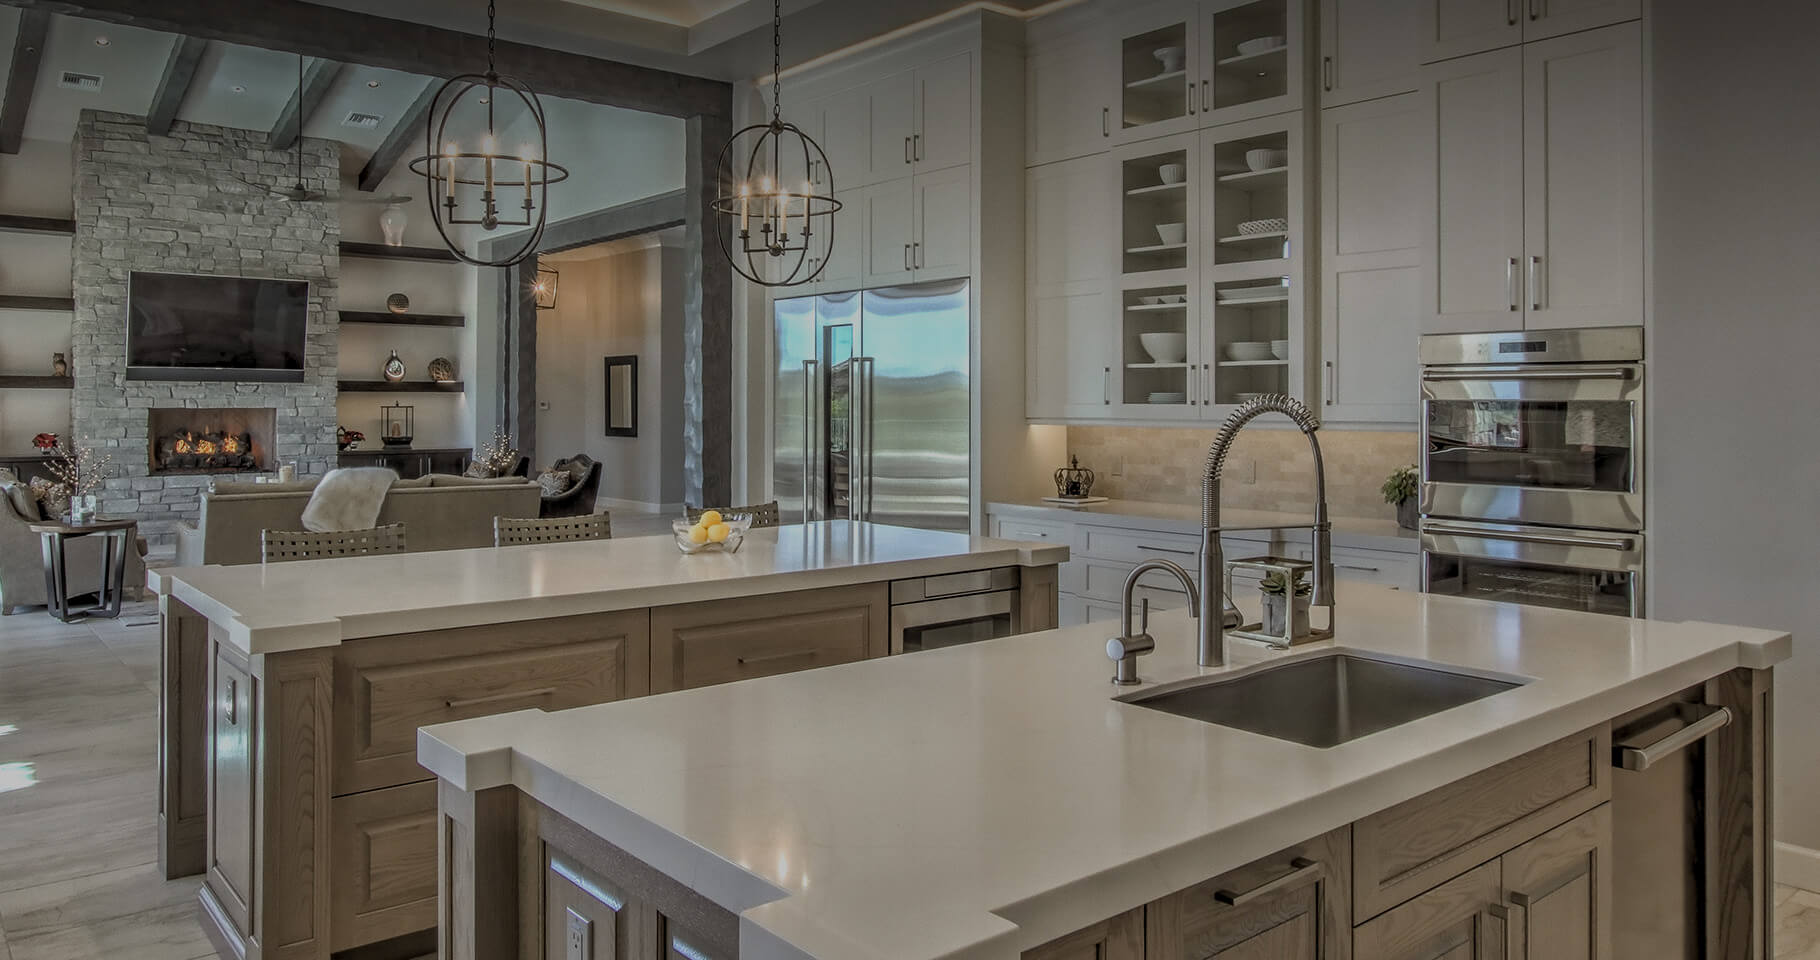 Scottsdale Kitchen Bath Cabinets Countertops In Scottsdale Az